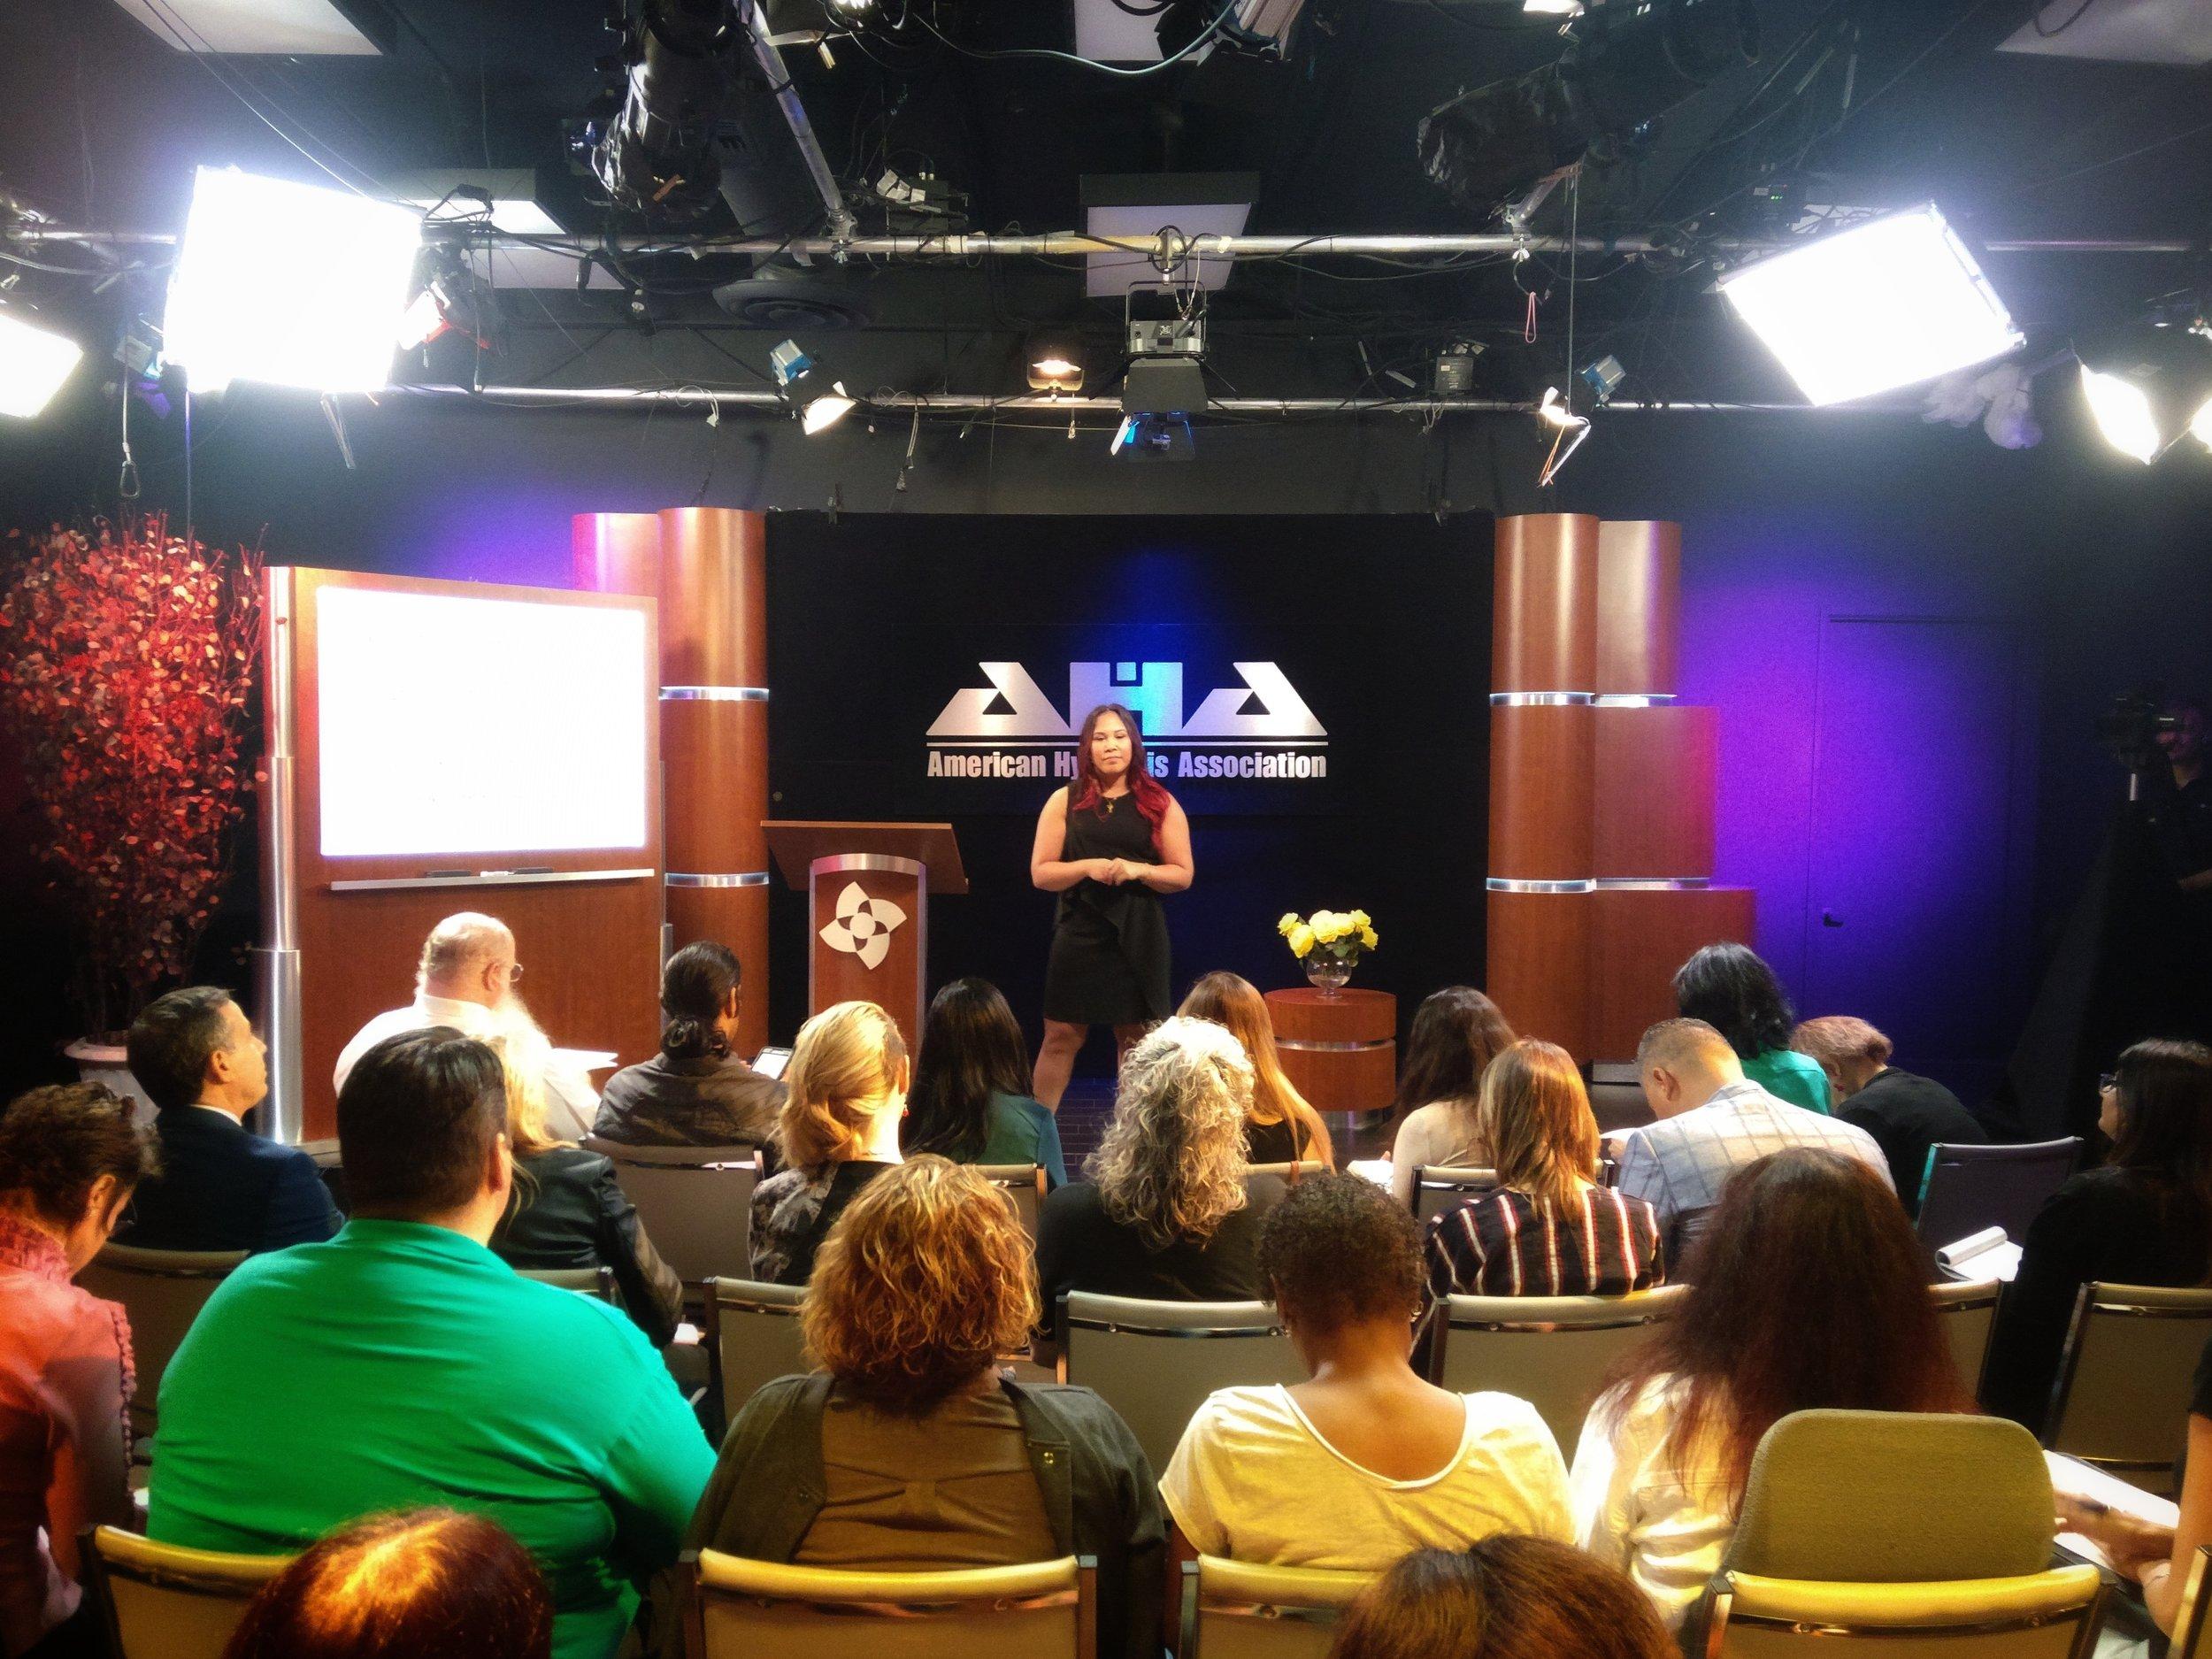 Amelia Fortes American Hypnosis Association.JPEG